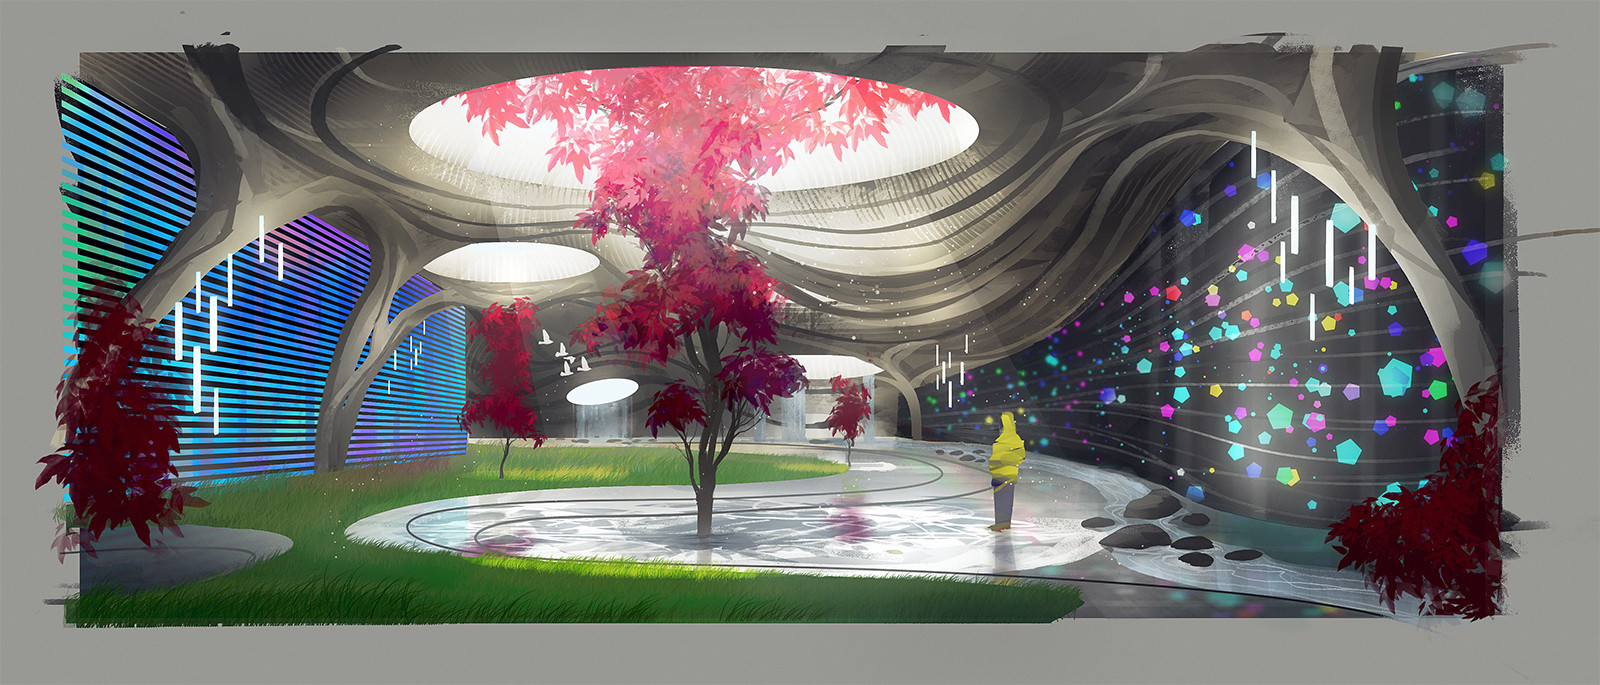 Izaak moody project canterbury atrium